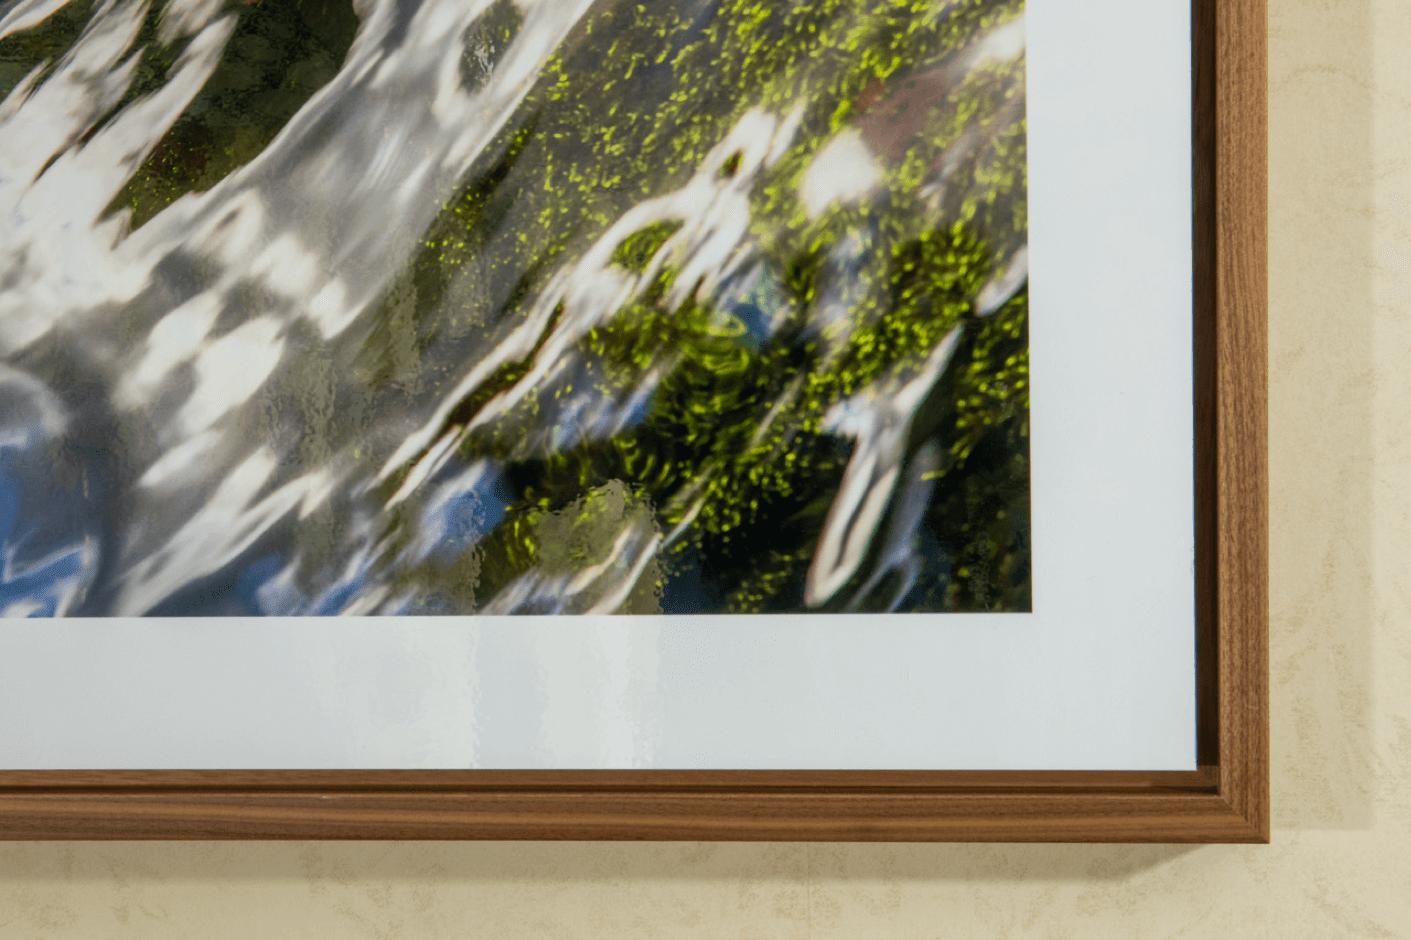 Exhibition framed, 600x400mm